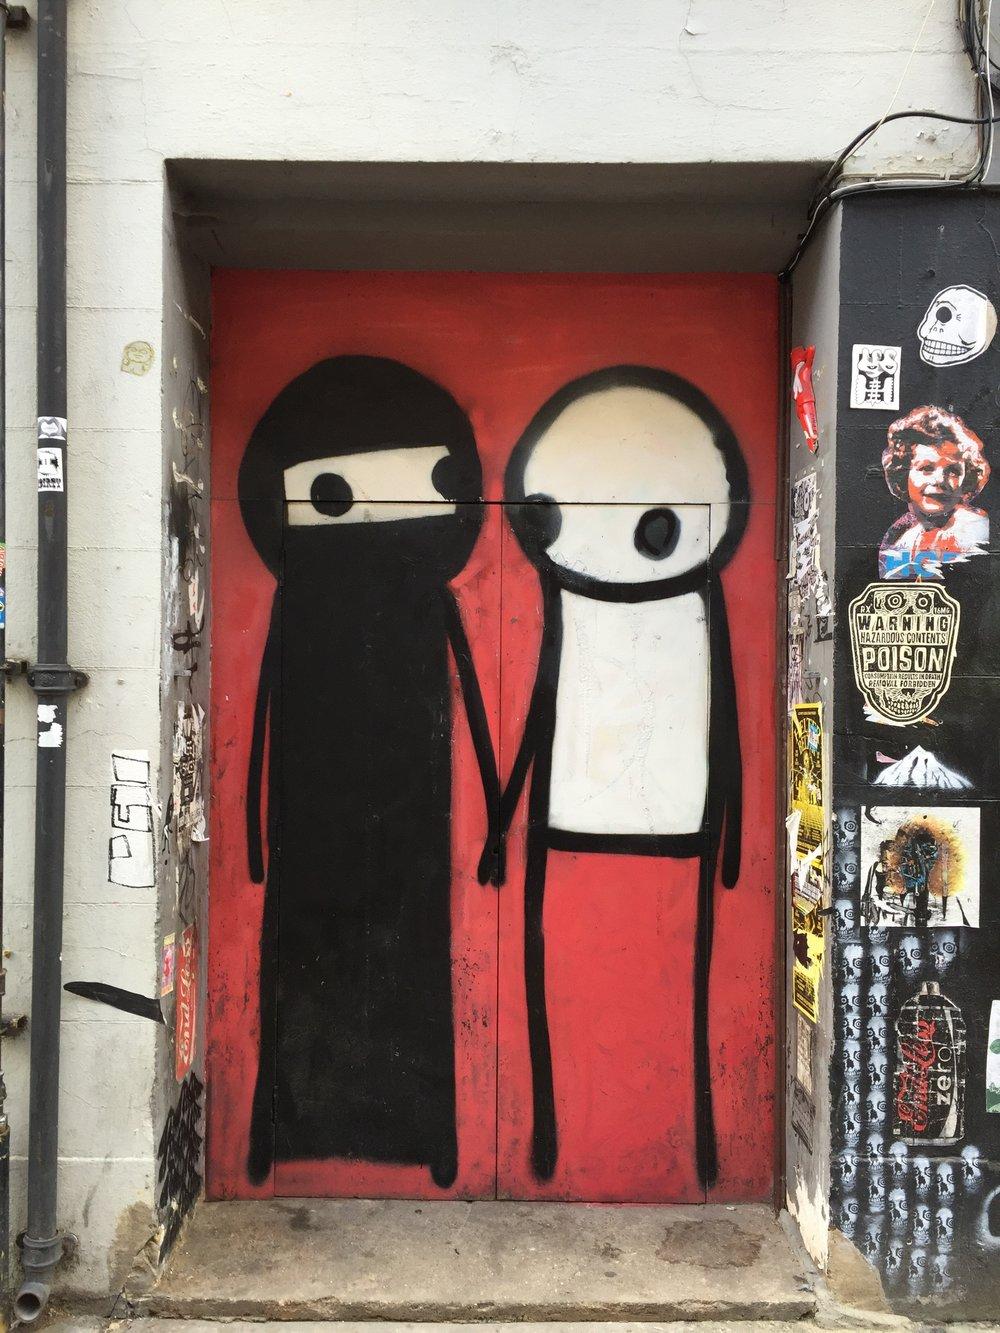 Mural painted in doorway down Princelet Street off of Brick Lane, London. Photographed by Reem Gallery in autumn 2016.